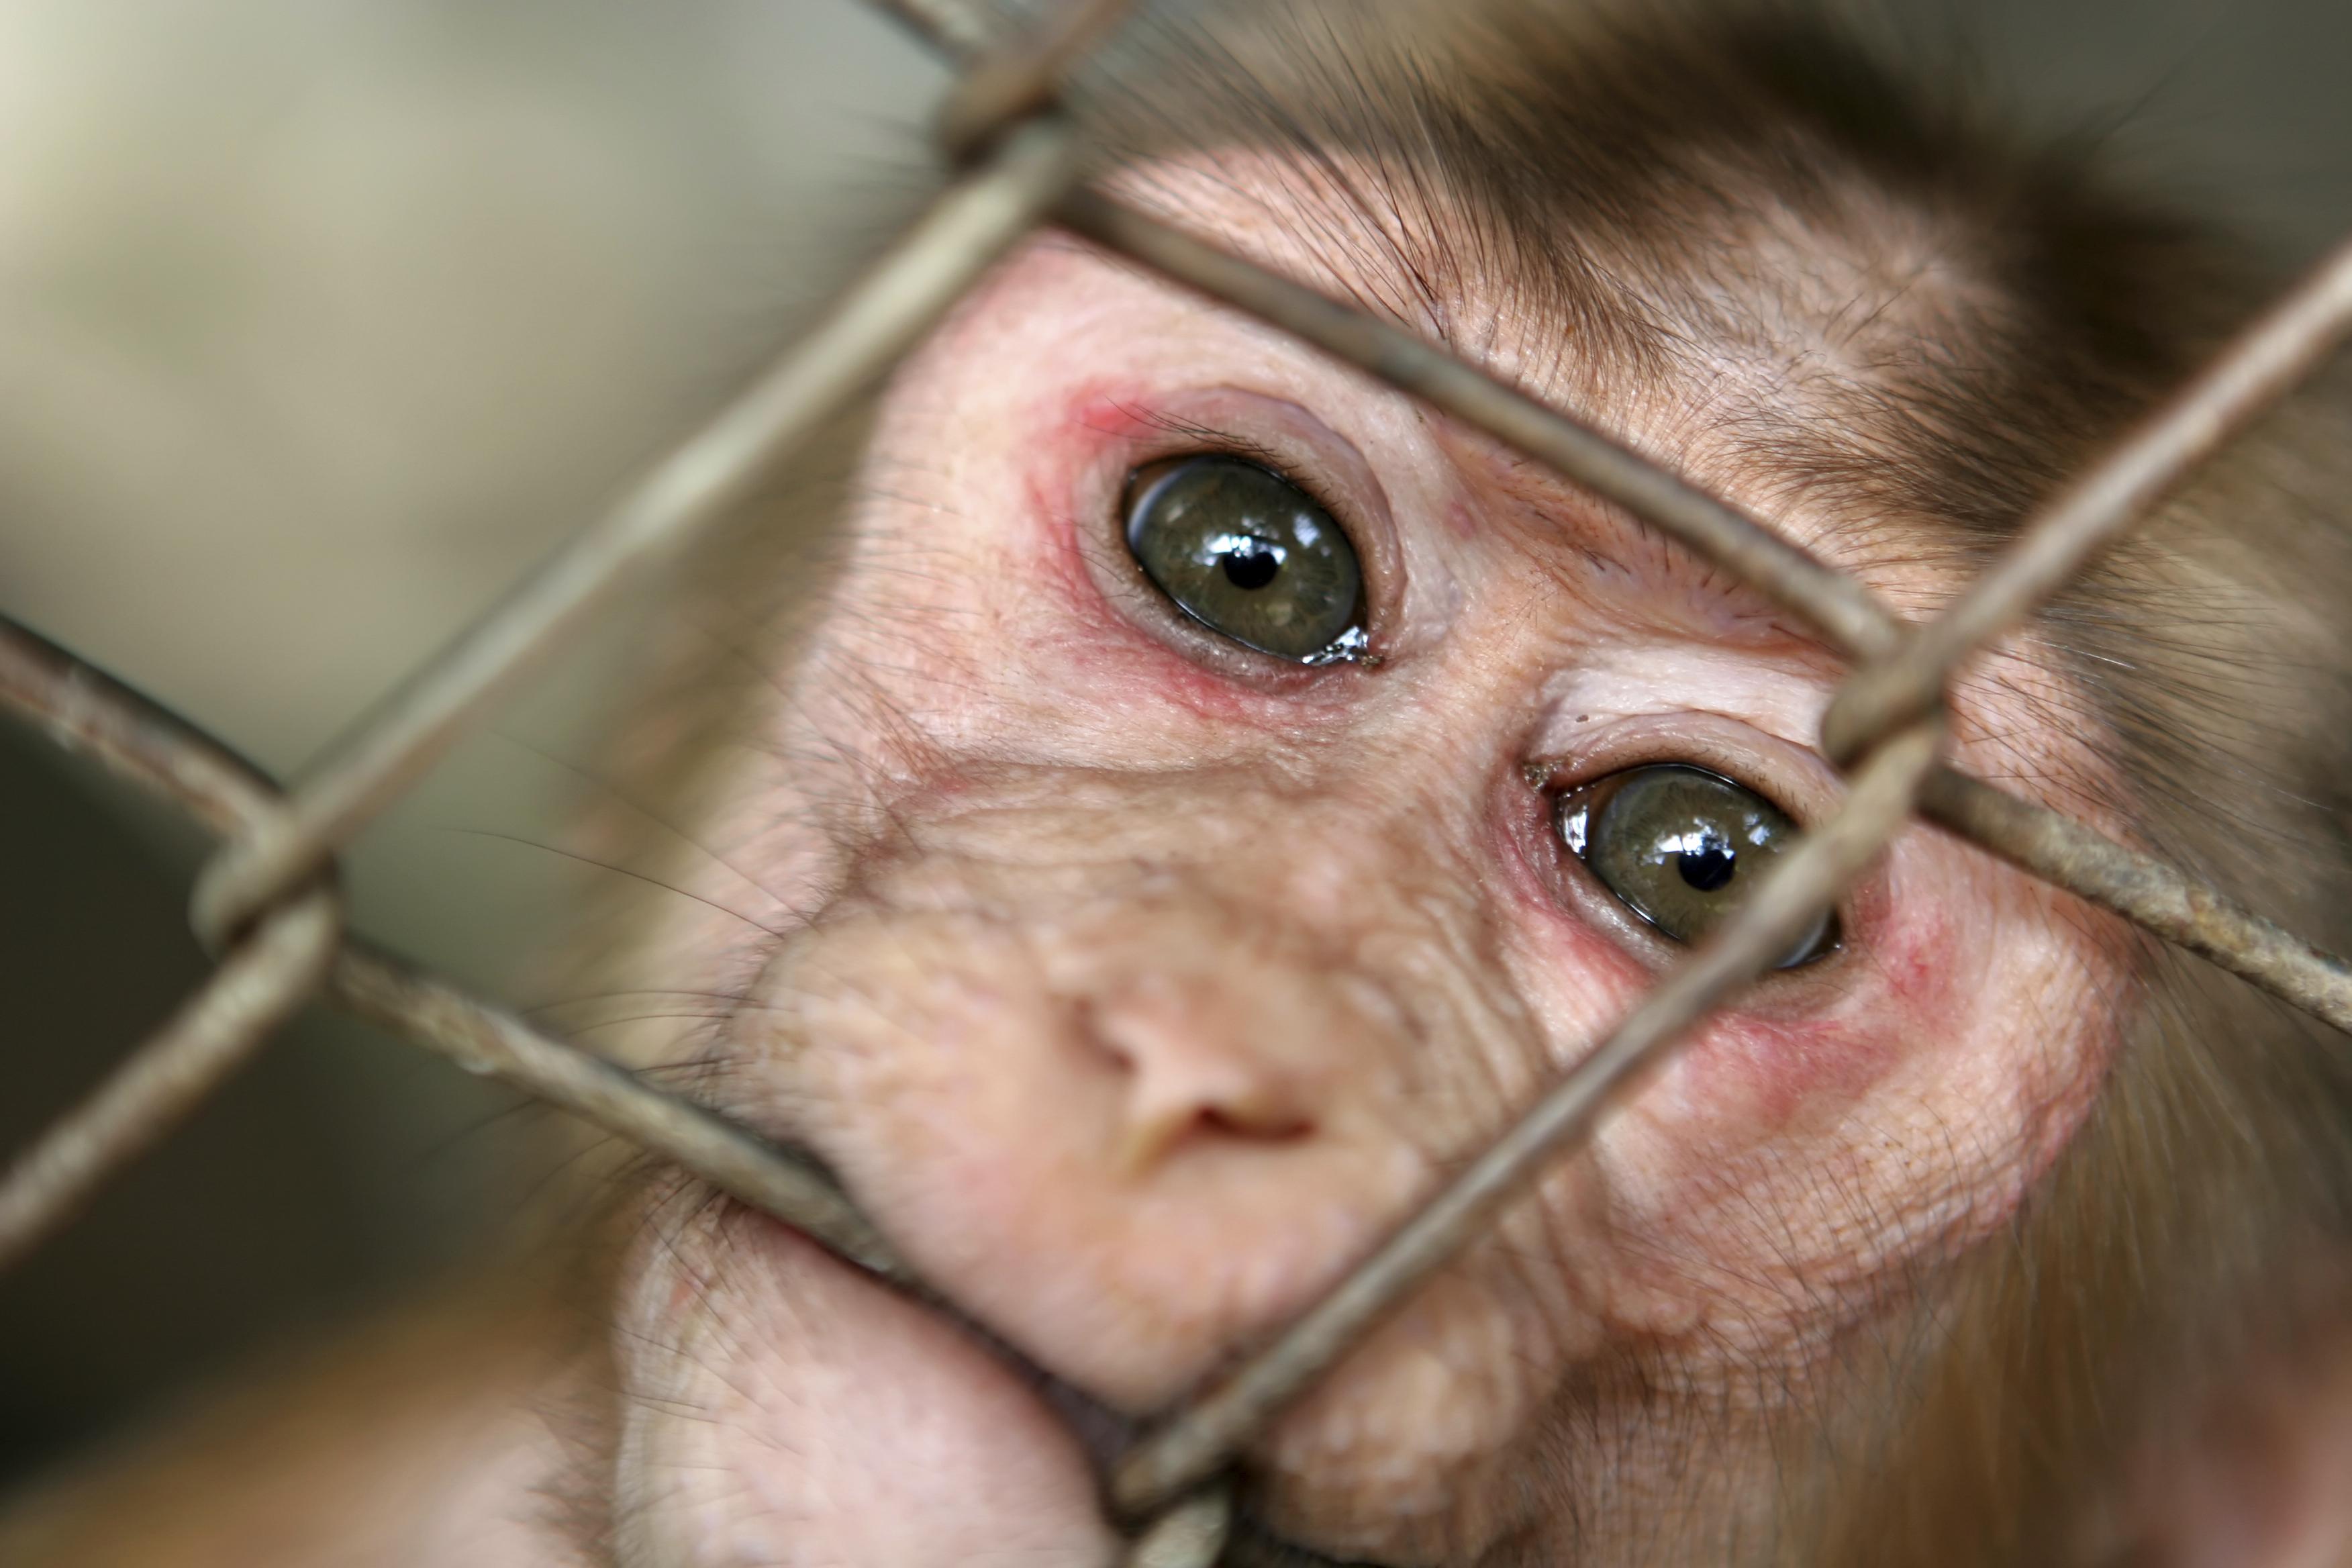 monkey_close_up_biting_bars.jpg